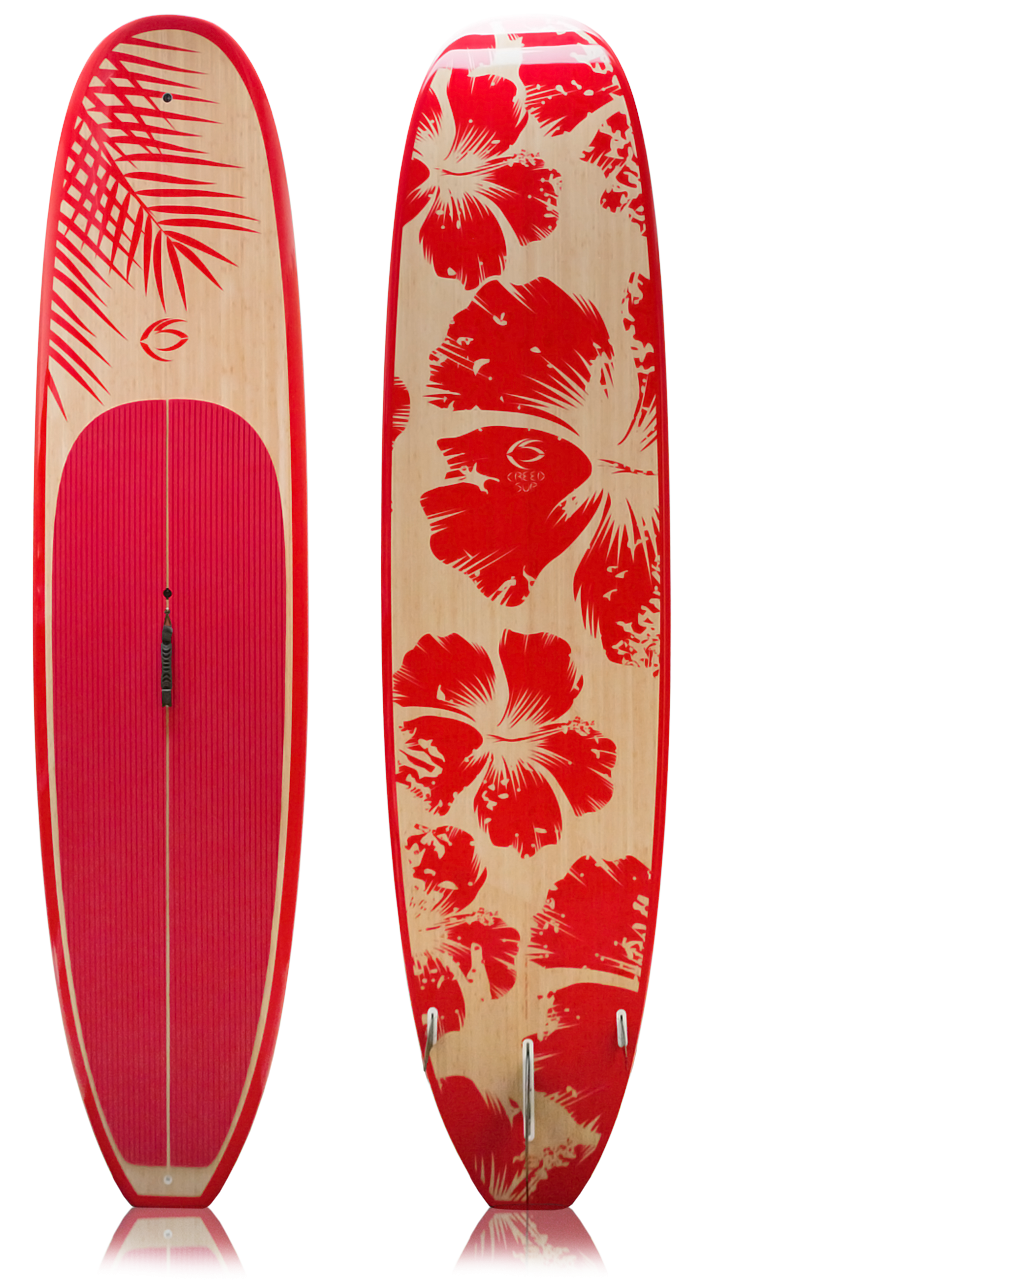 2820ab638a 11 foot bamboo paddle board |Creed SUP Talon Model - Red Veg | Salt ...